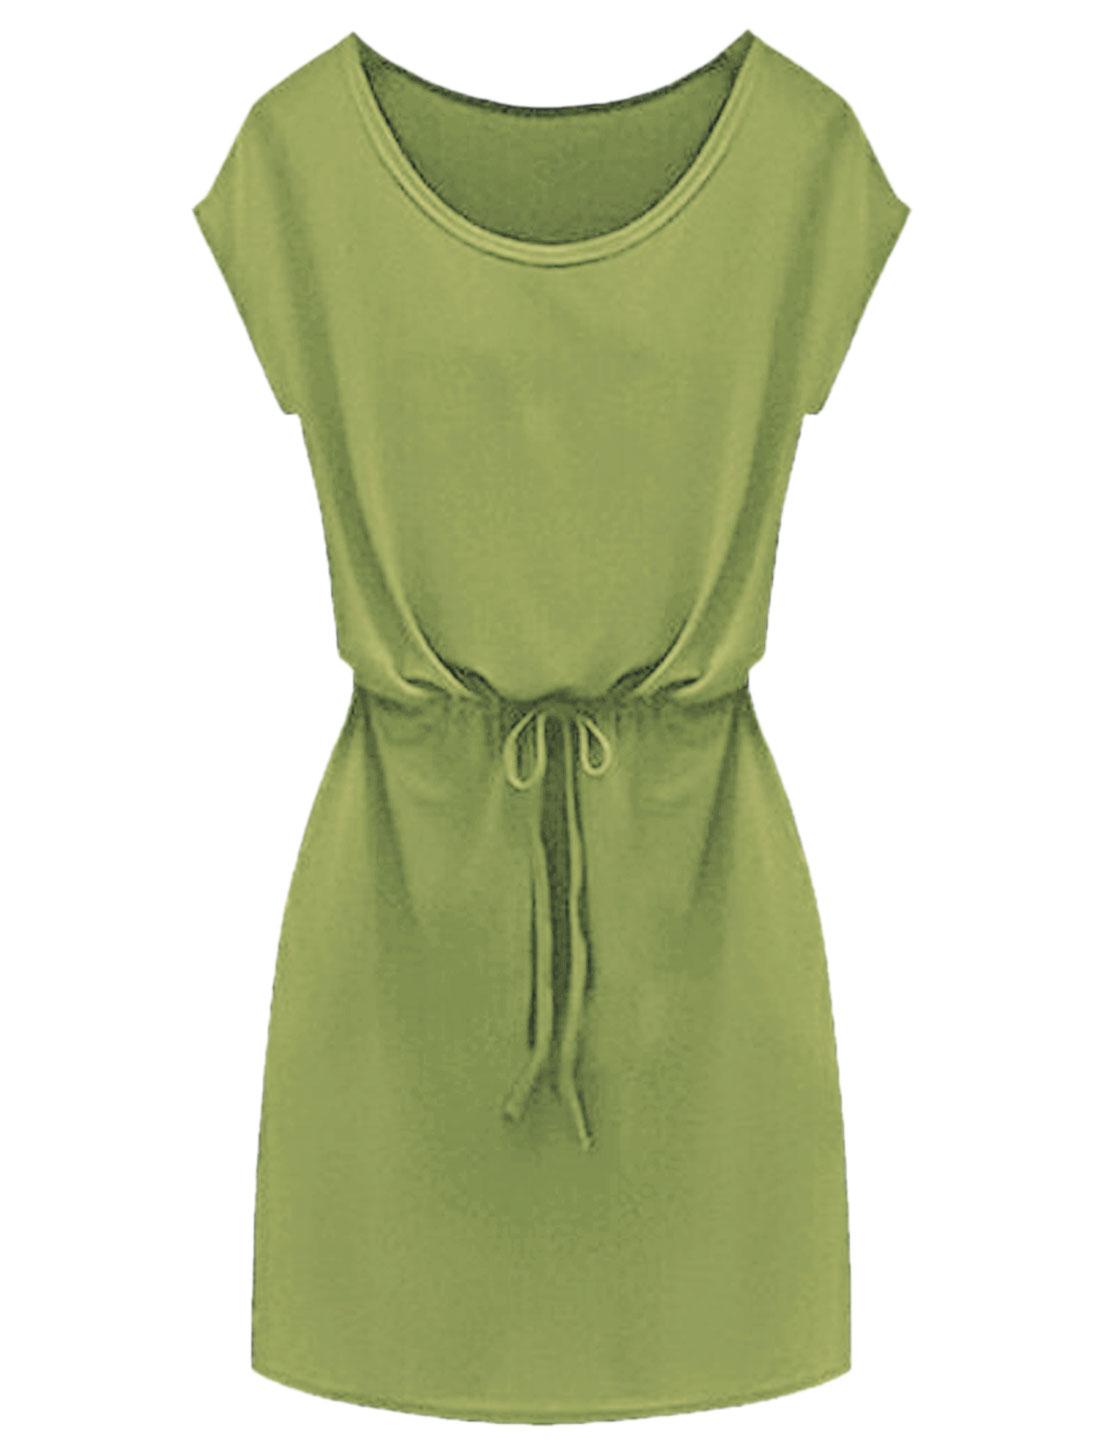 Lady Short Sleeves Seam Pockets Tunic Dress Army Green XS